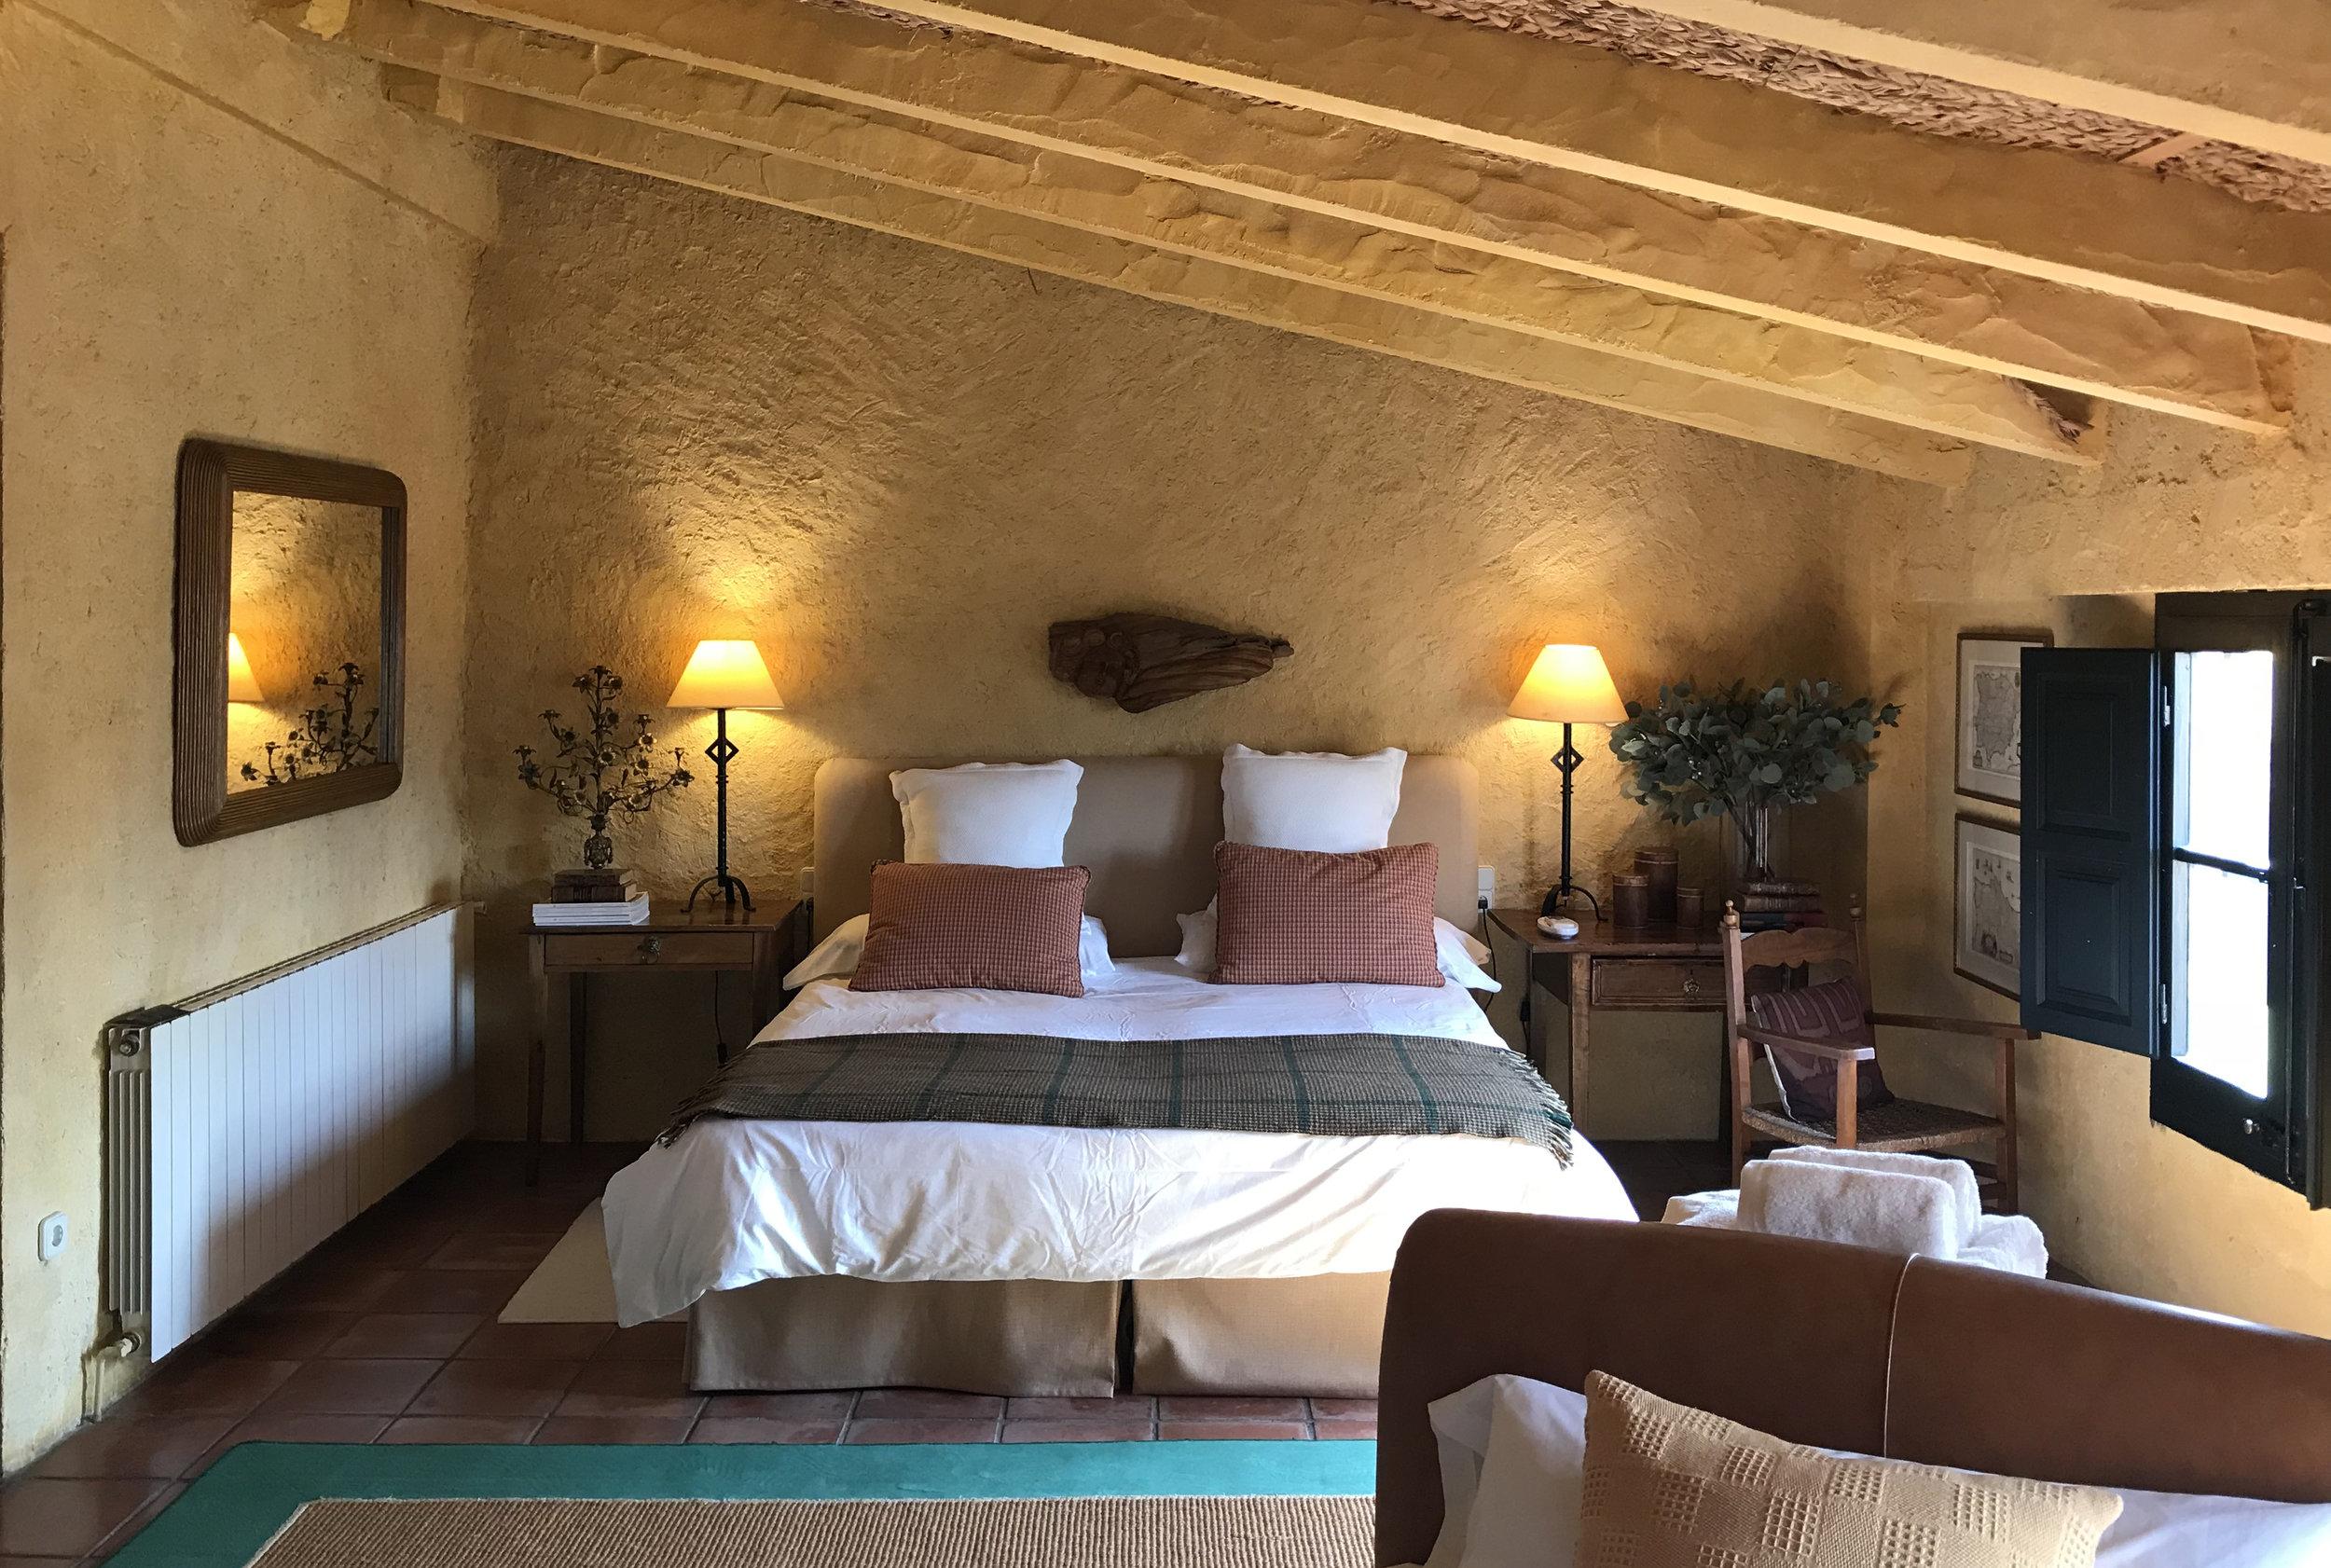 Amarilla bed1.jpg